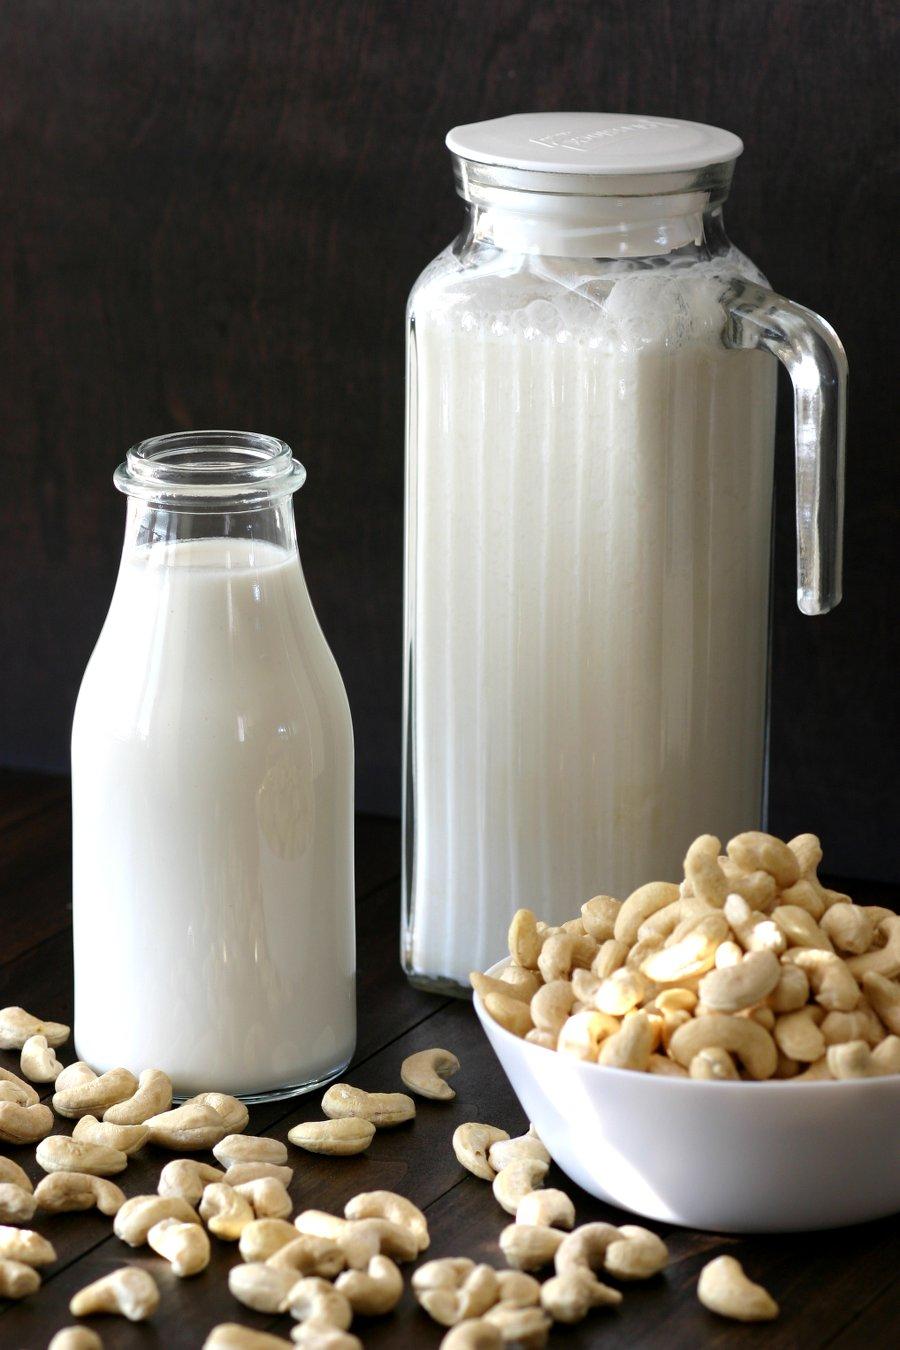 Make your own creamy, homemade Cashew Milk and Cashew Cream with this straightforward, 3-ingredient recipe.